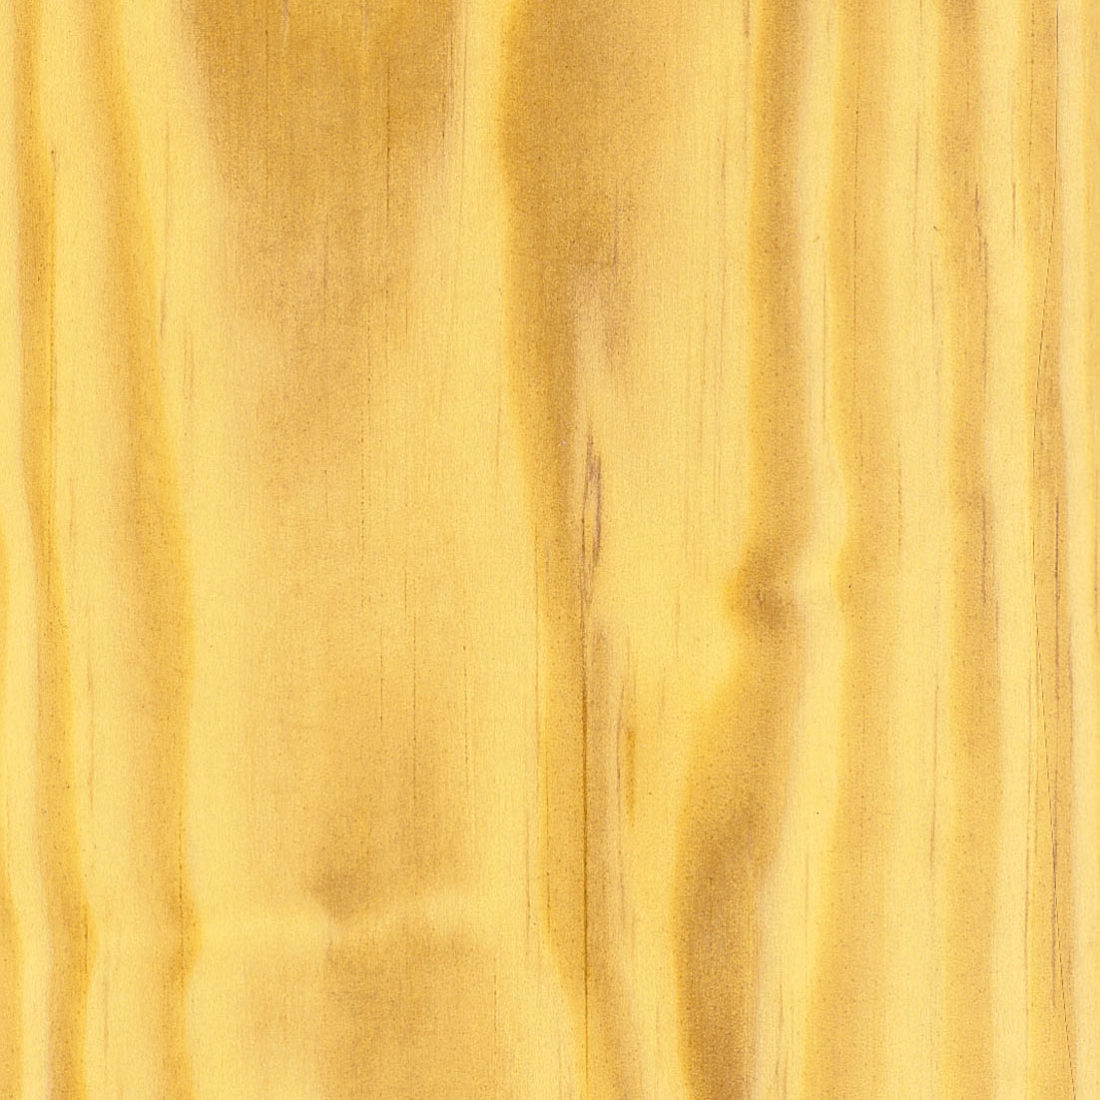 madera de pino amarillo del sur